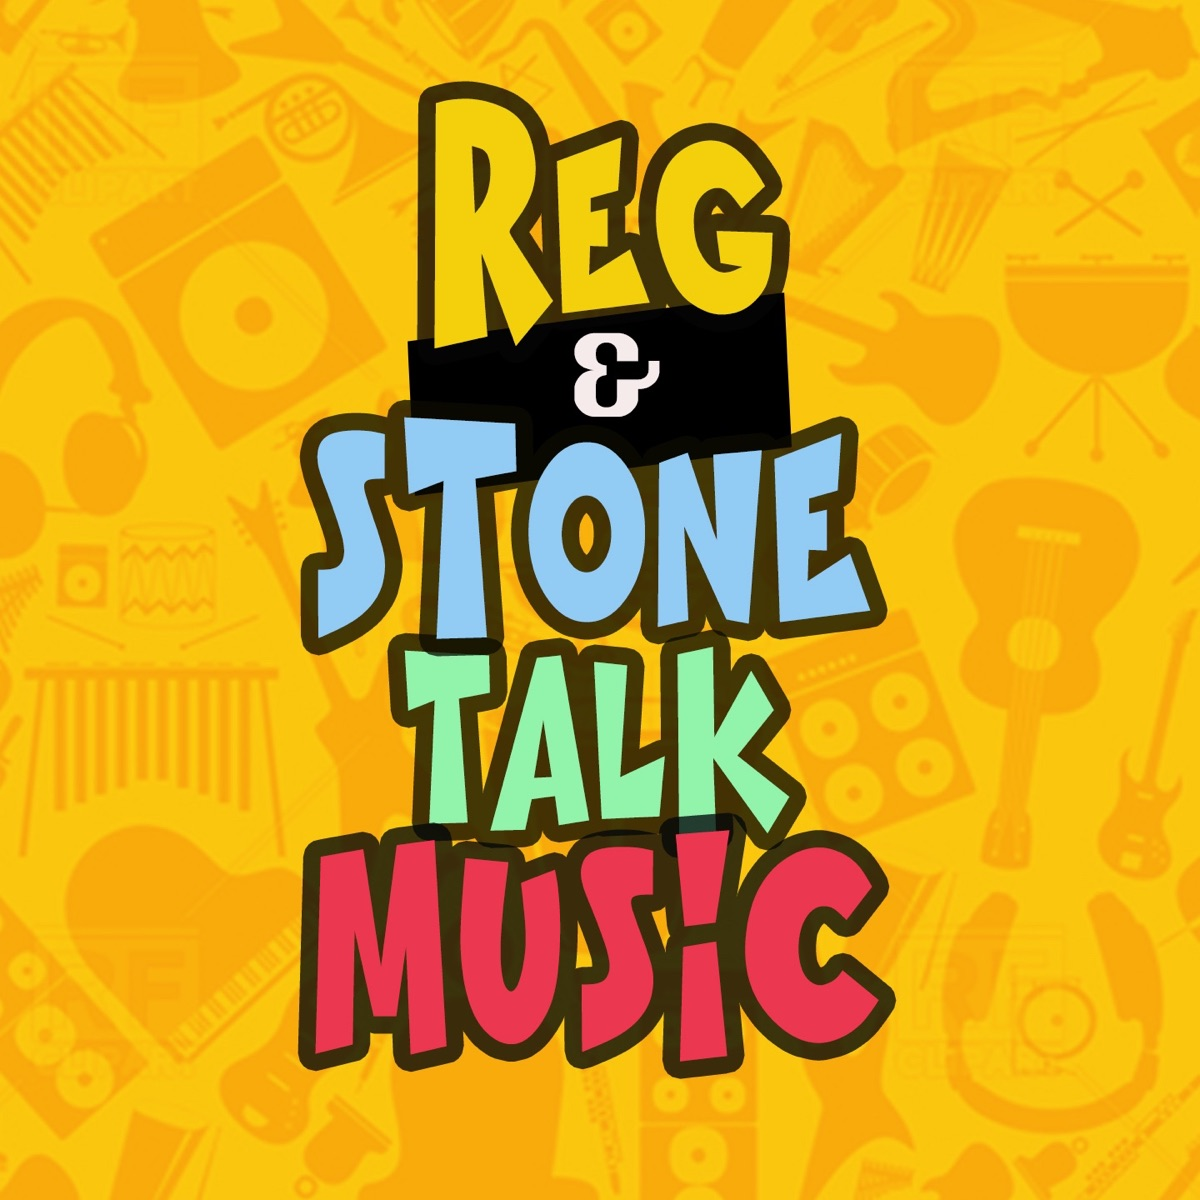 Reg and Stone Talk Music!